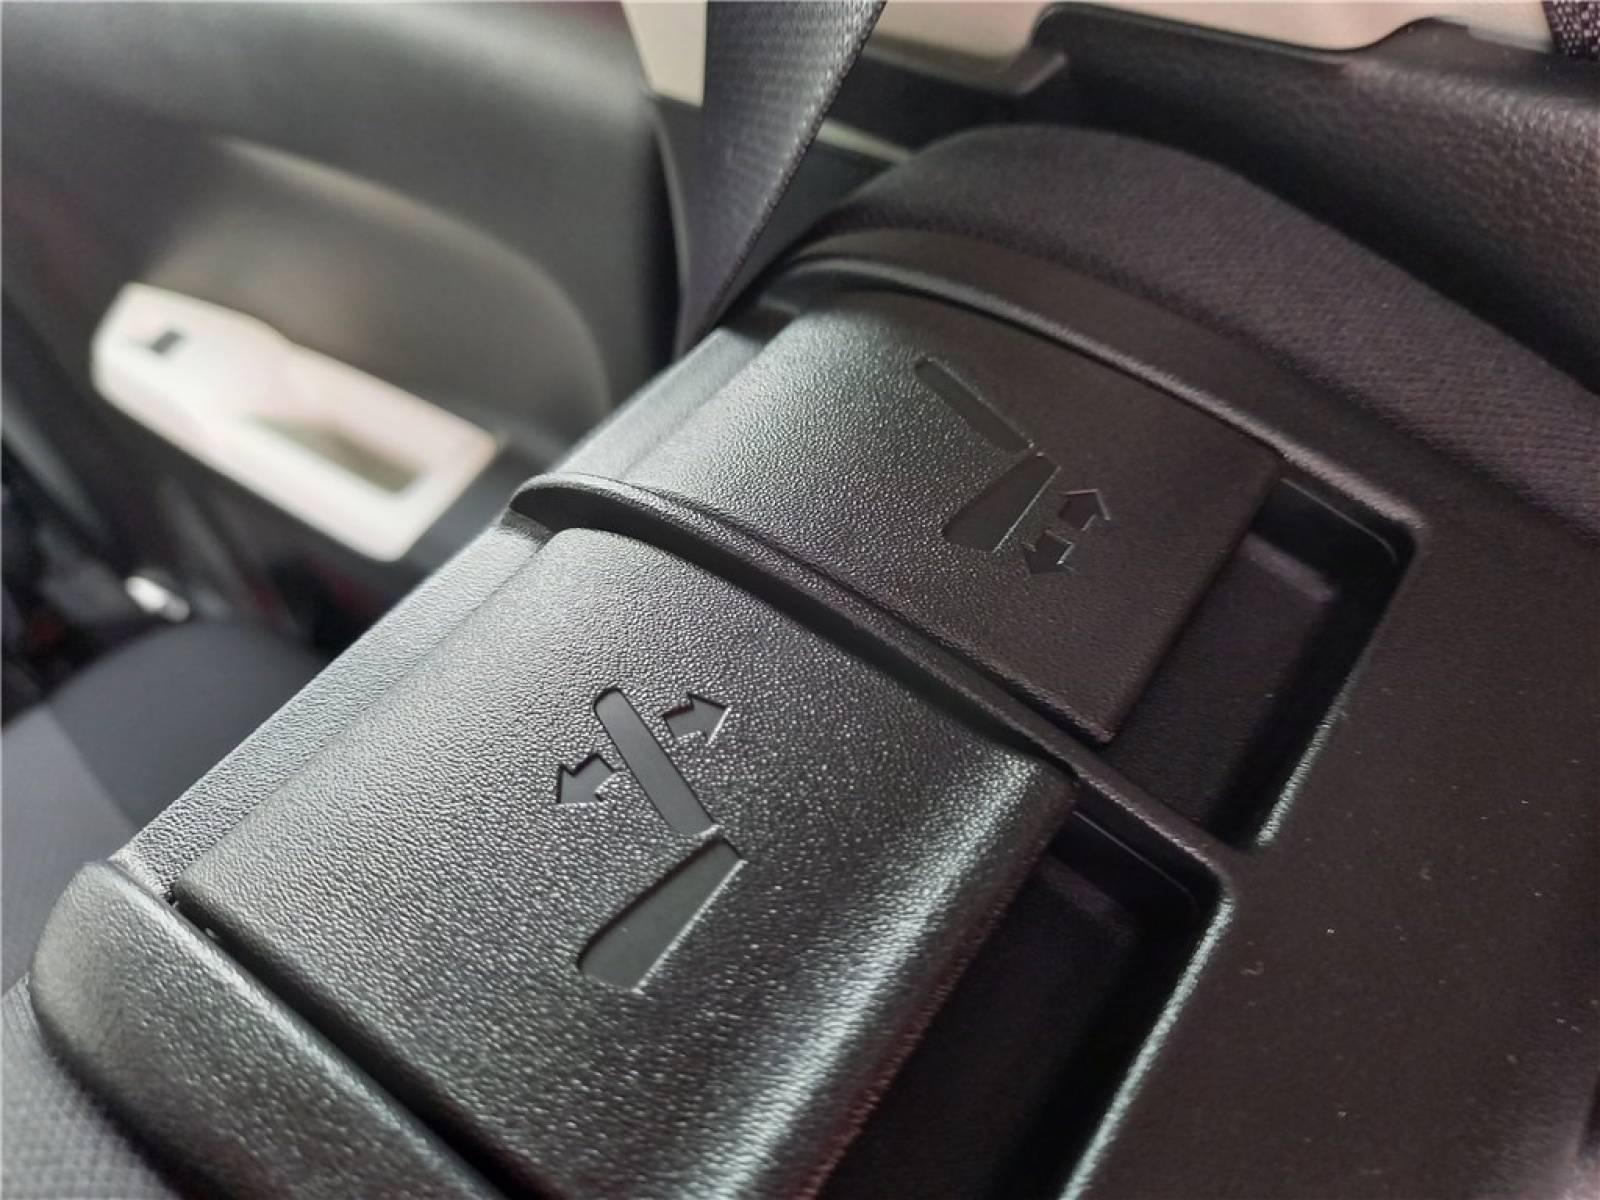 SUZUKI Ignis 1.2 Dualjet Auto (AGS) - véhicule d'occasion - Groupe Guillet - Opel Magicauto - Chalon-sur-Saône - 71380 - Saint-Marcel - 14